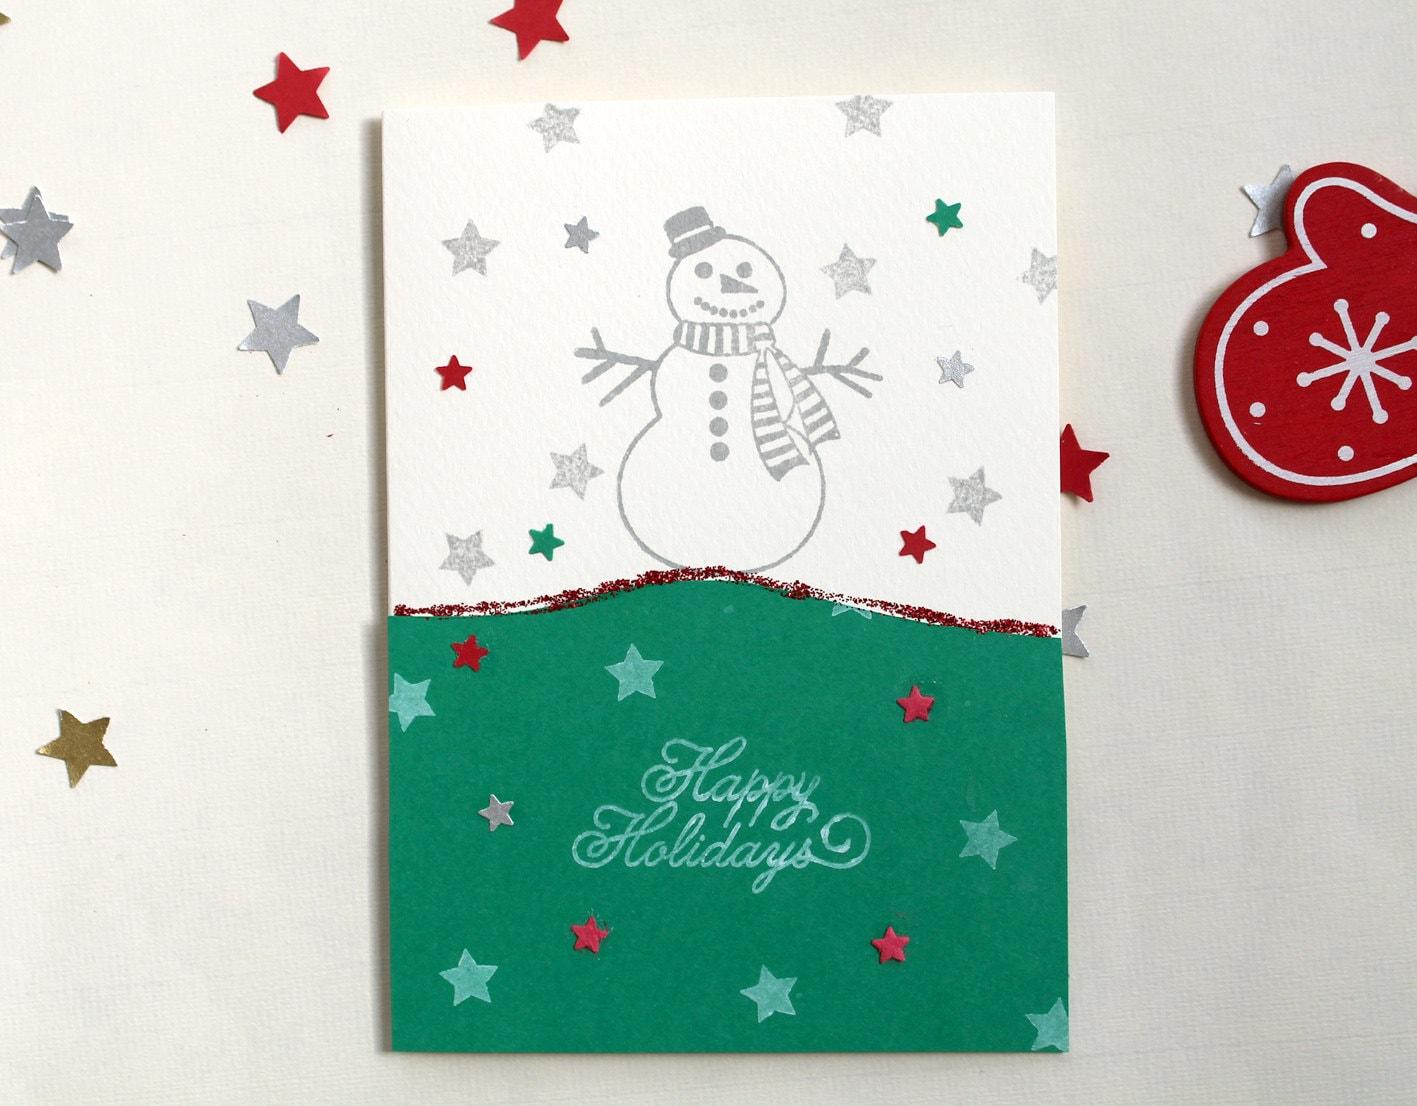 Lighting for Handmade snowman christmas cards